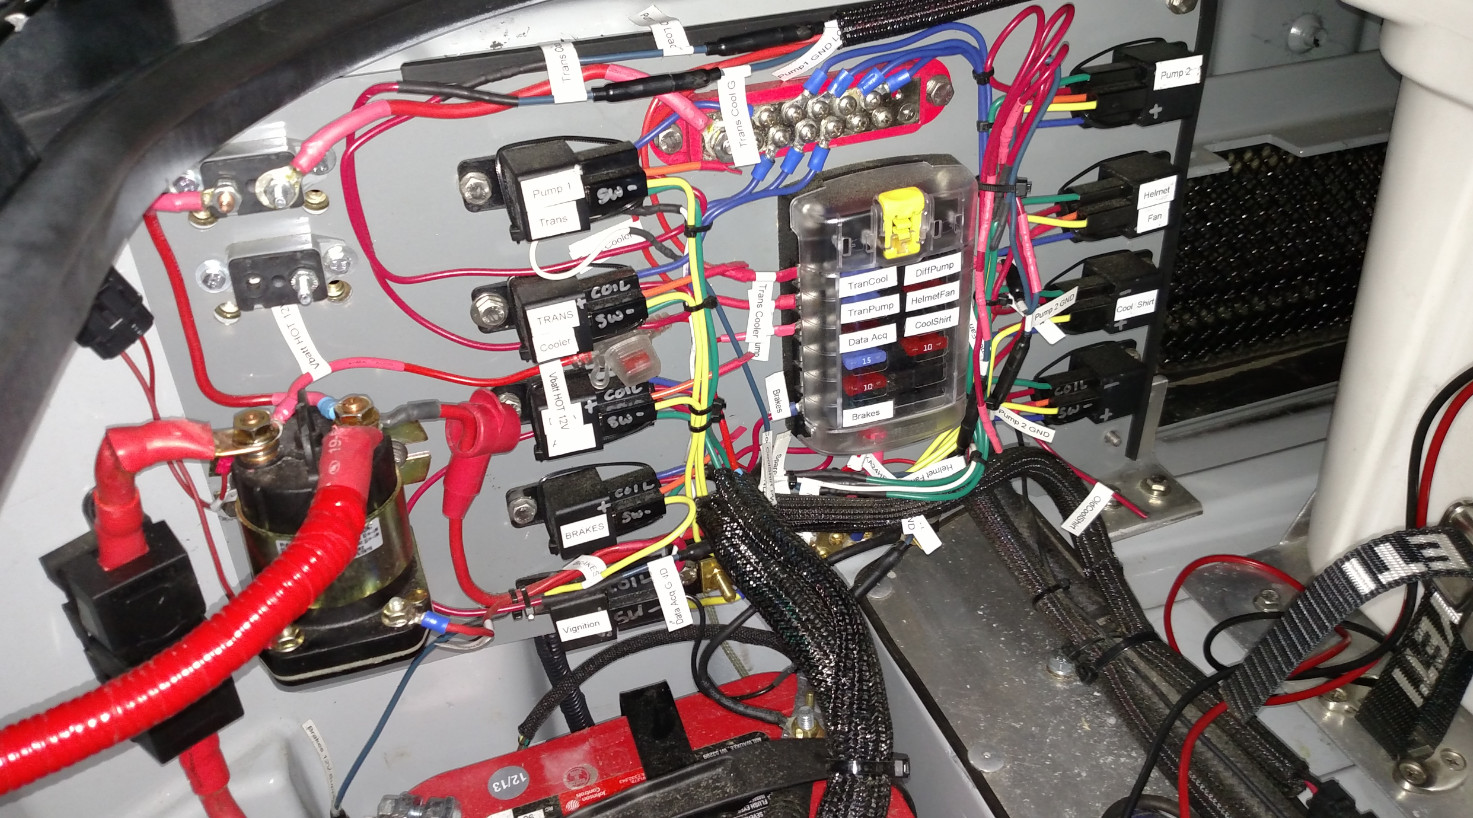 Drag Car Wiring Schematic Basic | Wiring Diagram Race Car Wiring on